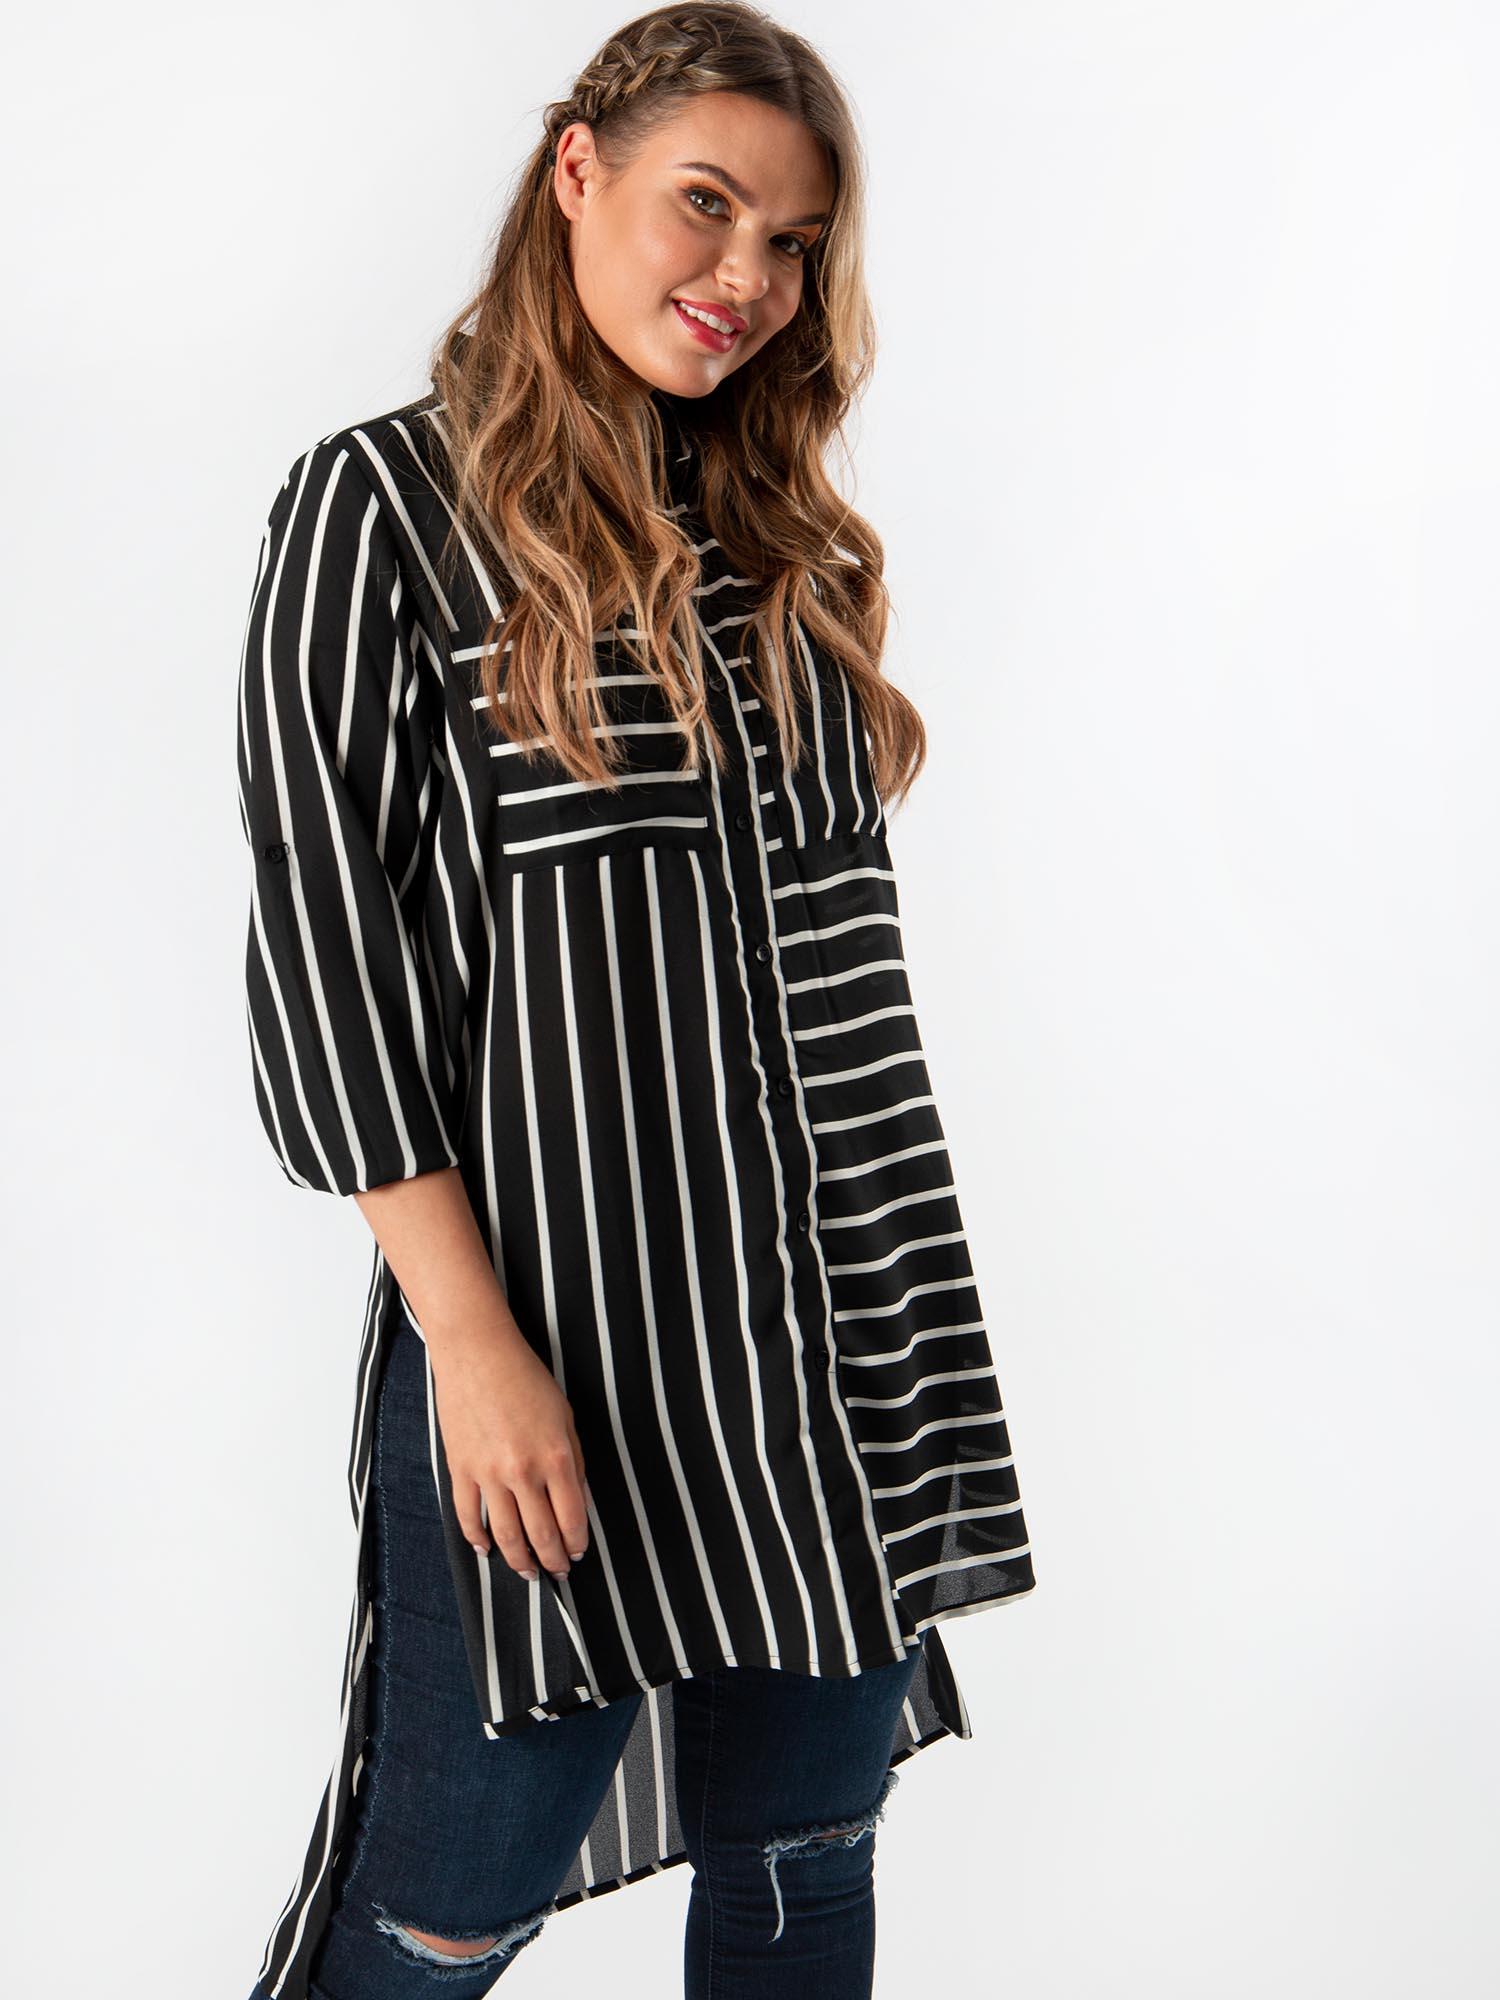 Koko Womens Plus Size Black and White Stripe Longline Shirt